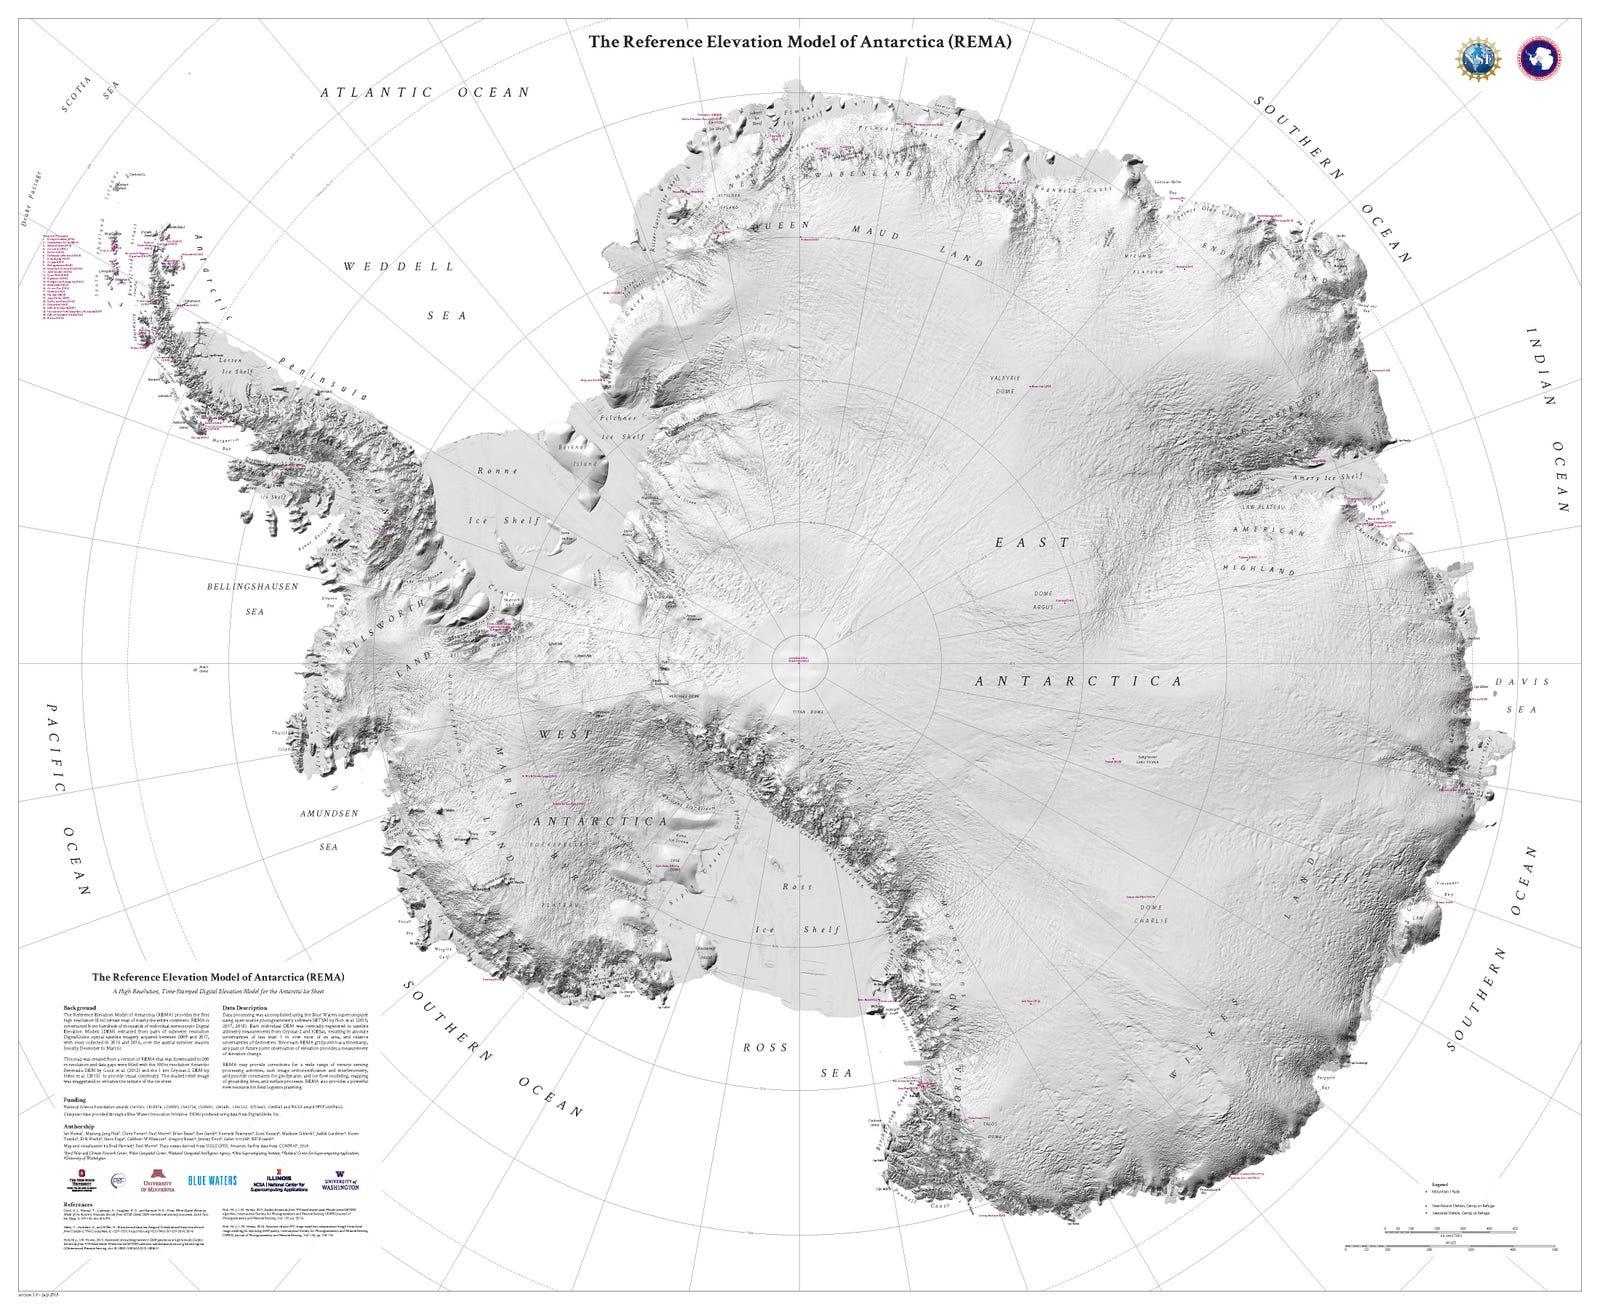 New Super-High-Resolution Map Shows Antarctica In Unprecedented Detail